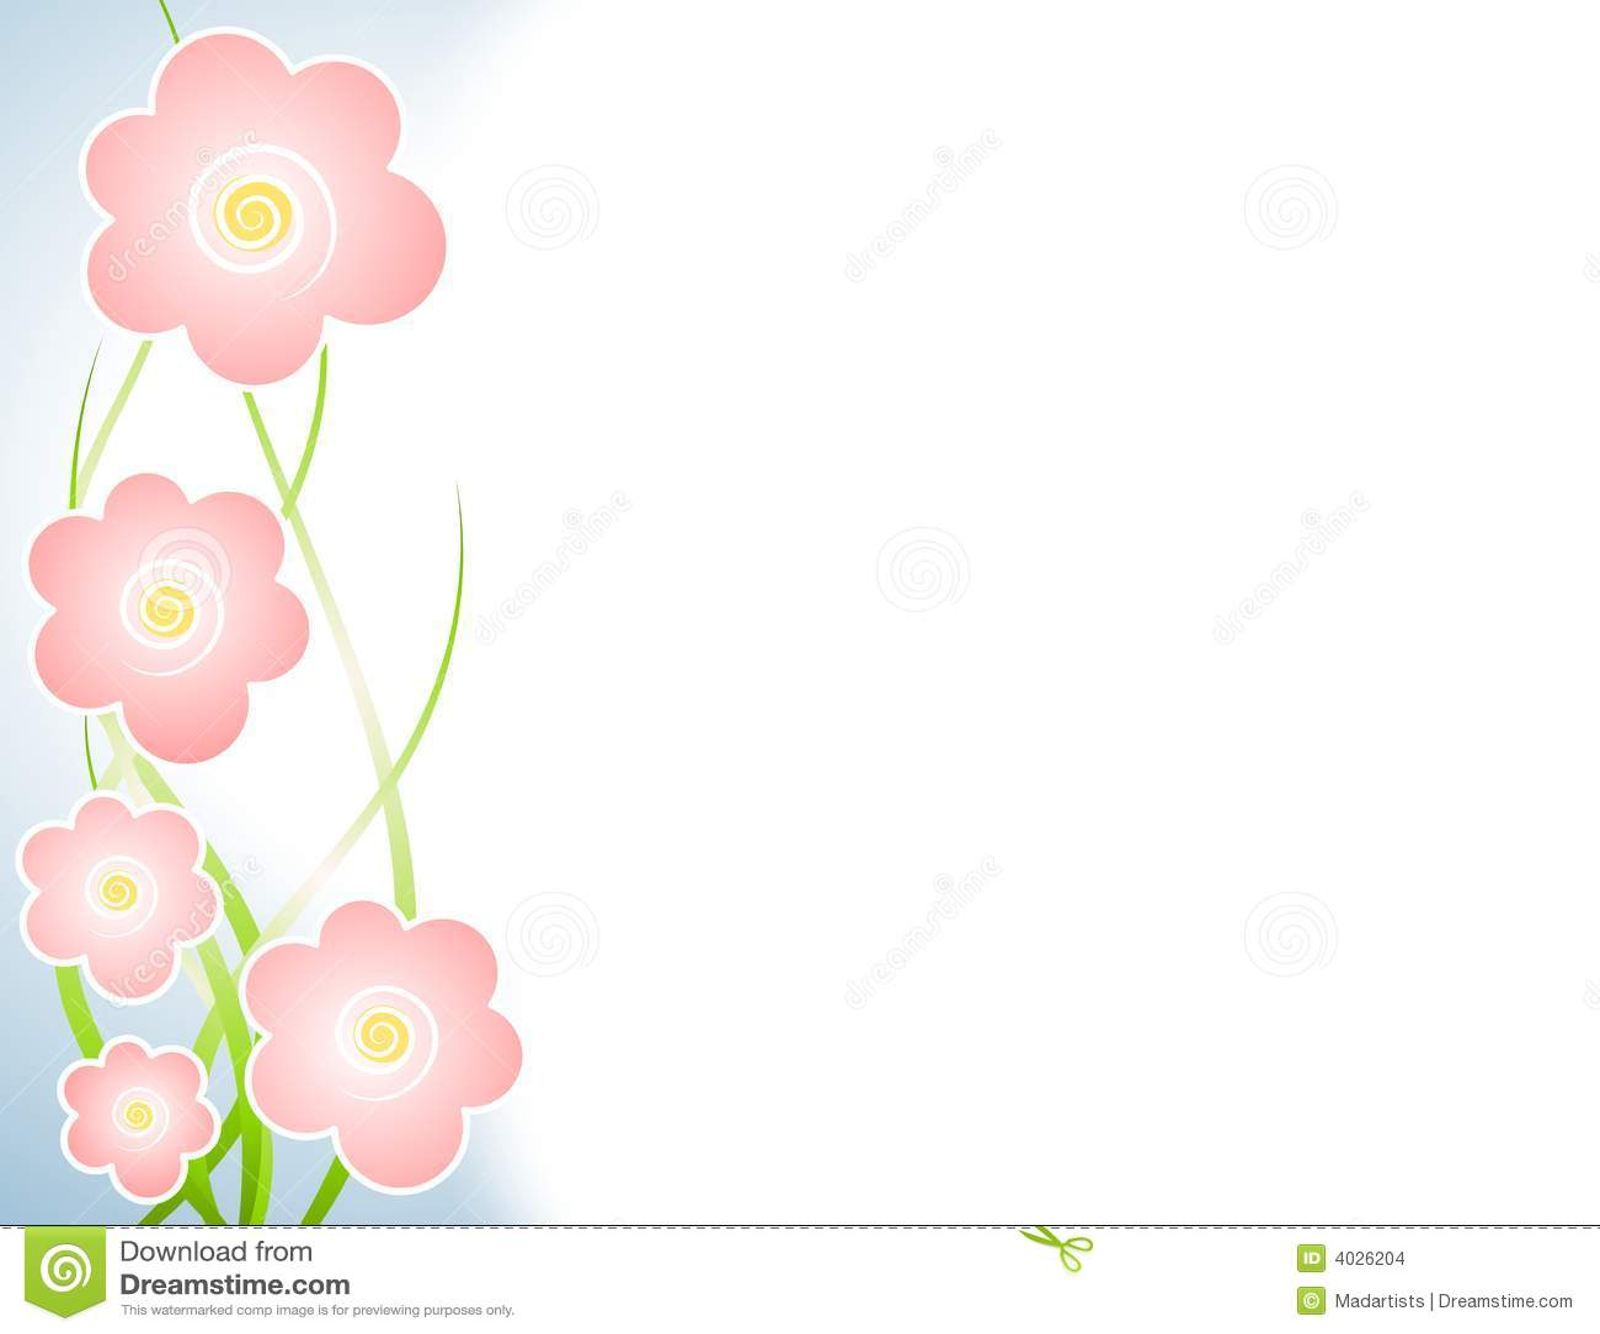 Springtime Flower Borders